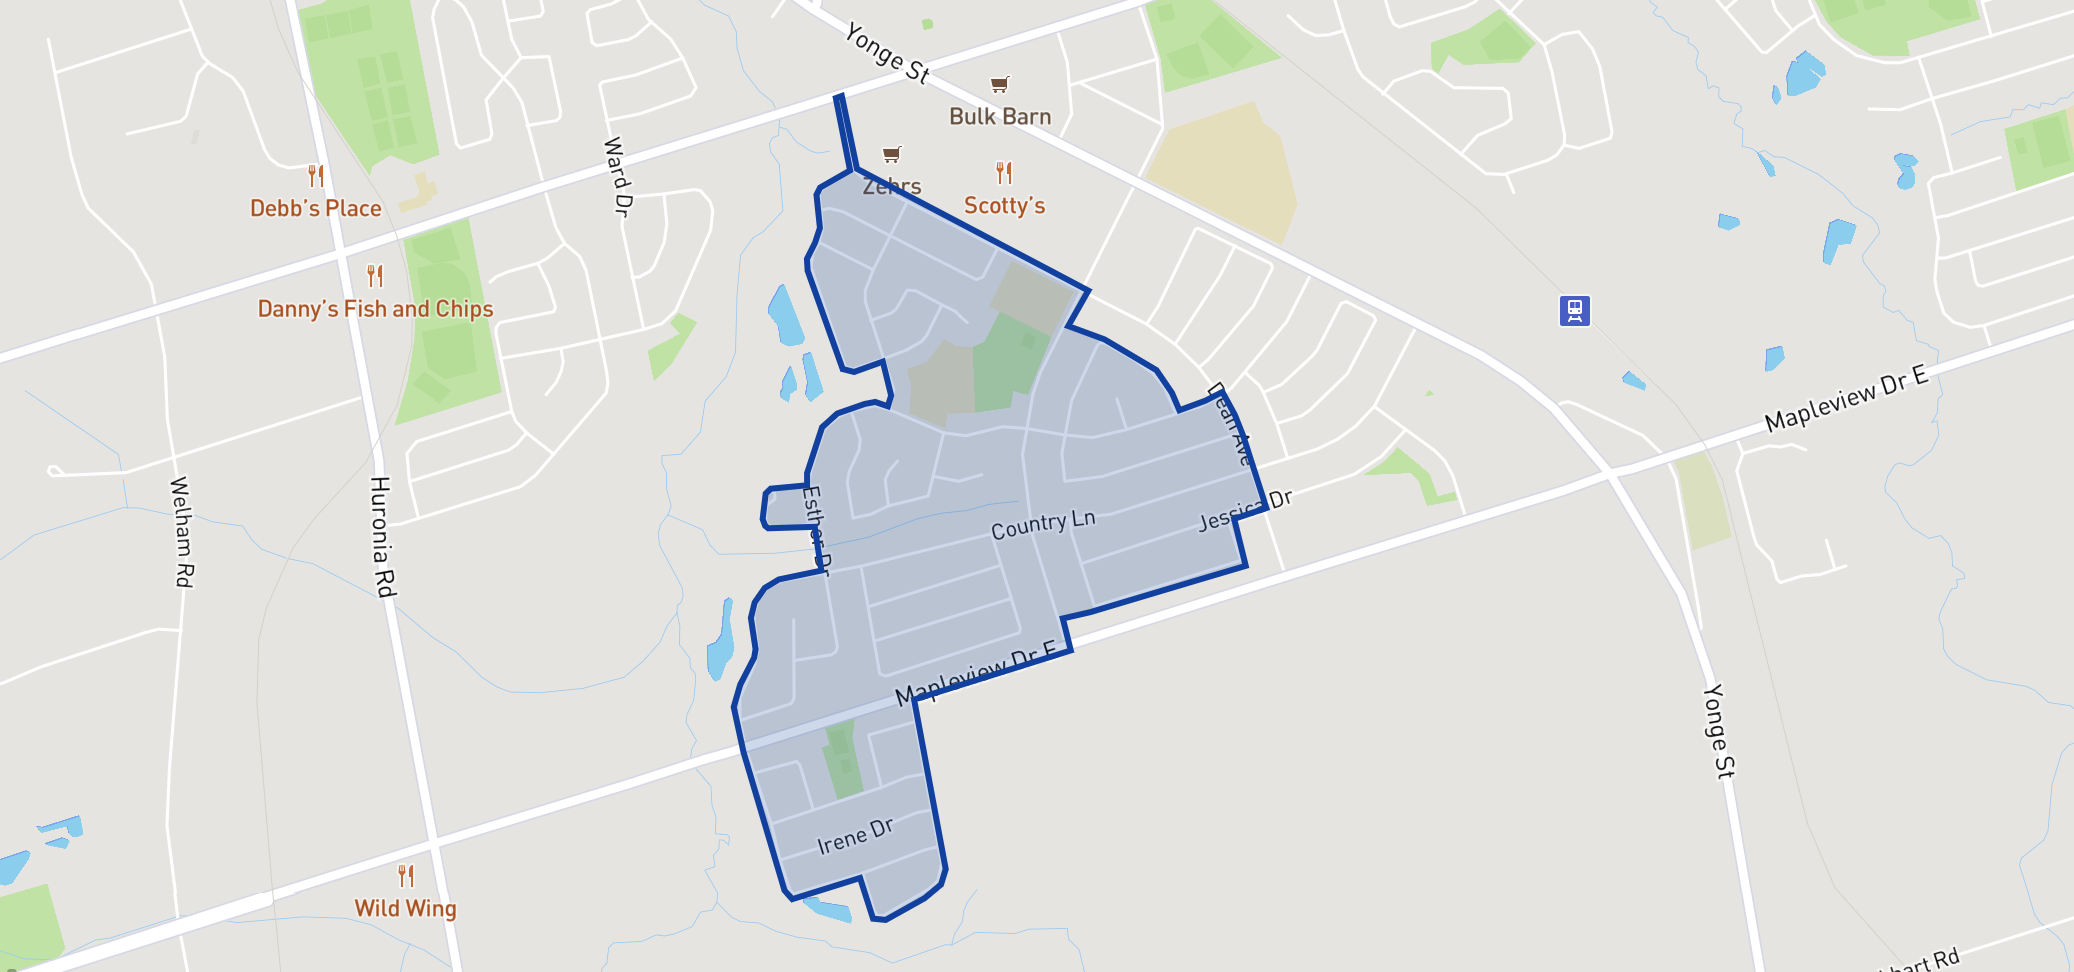 Mapleview Heights Elementary School neighbourhood borders